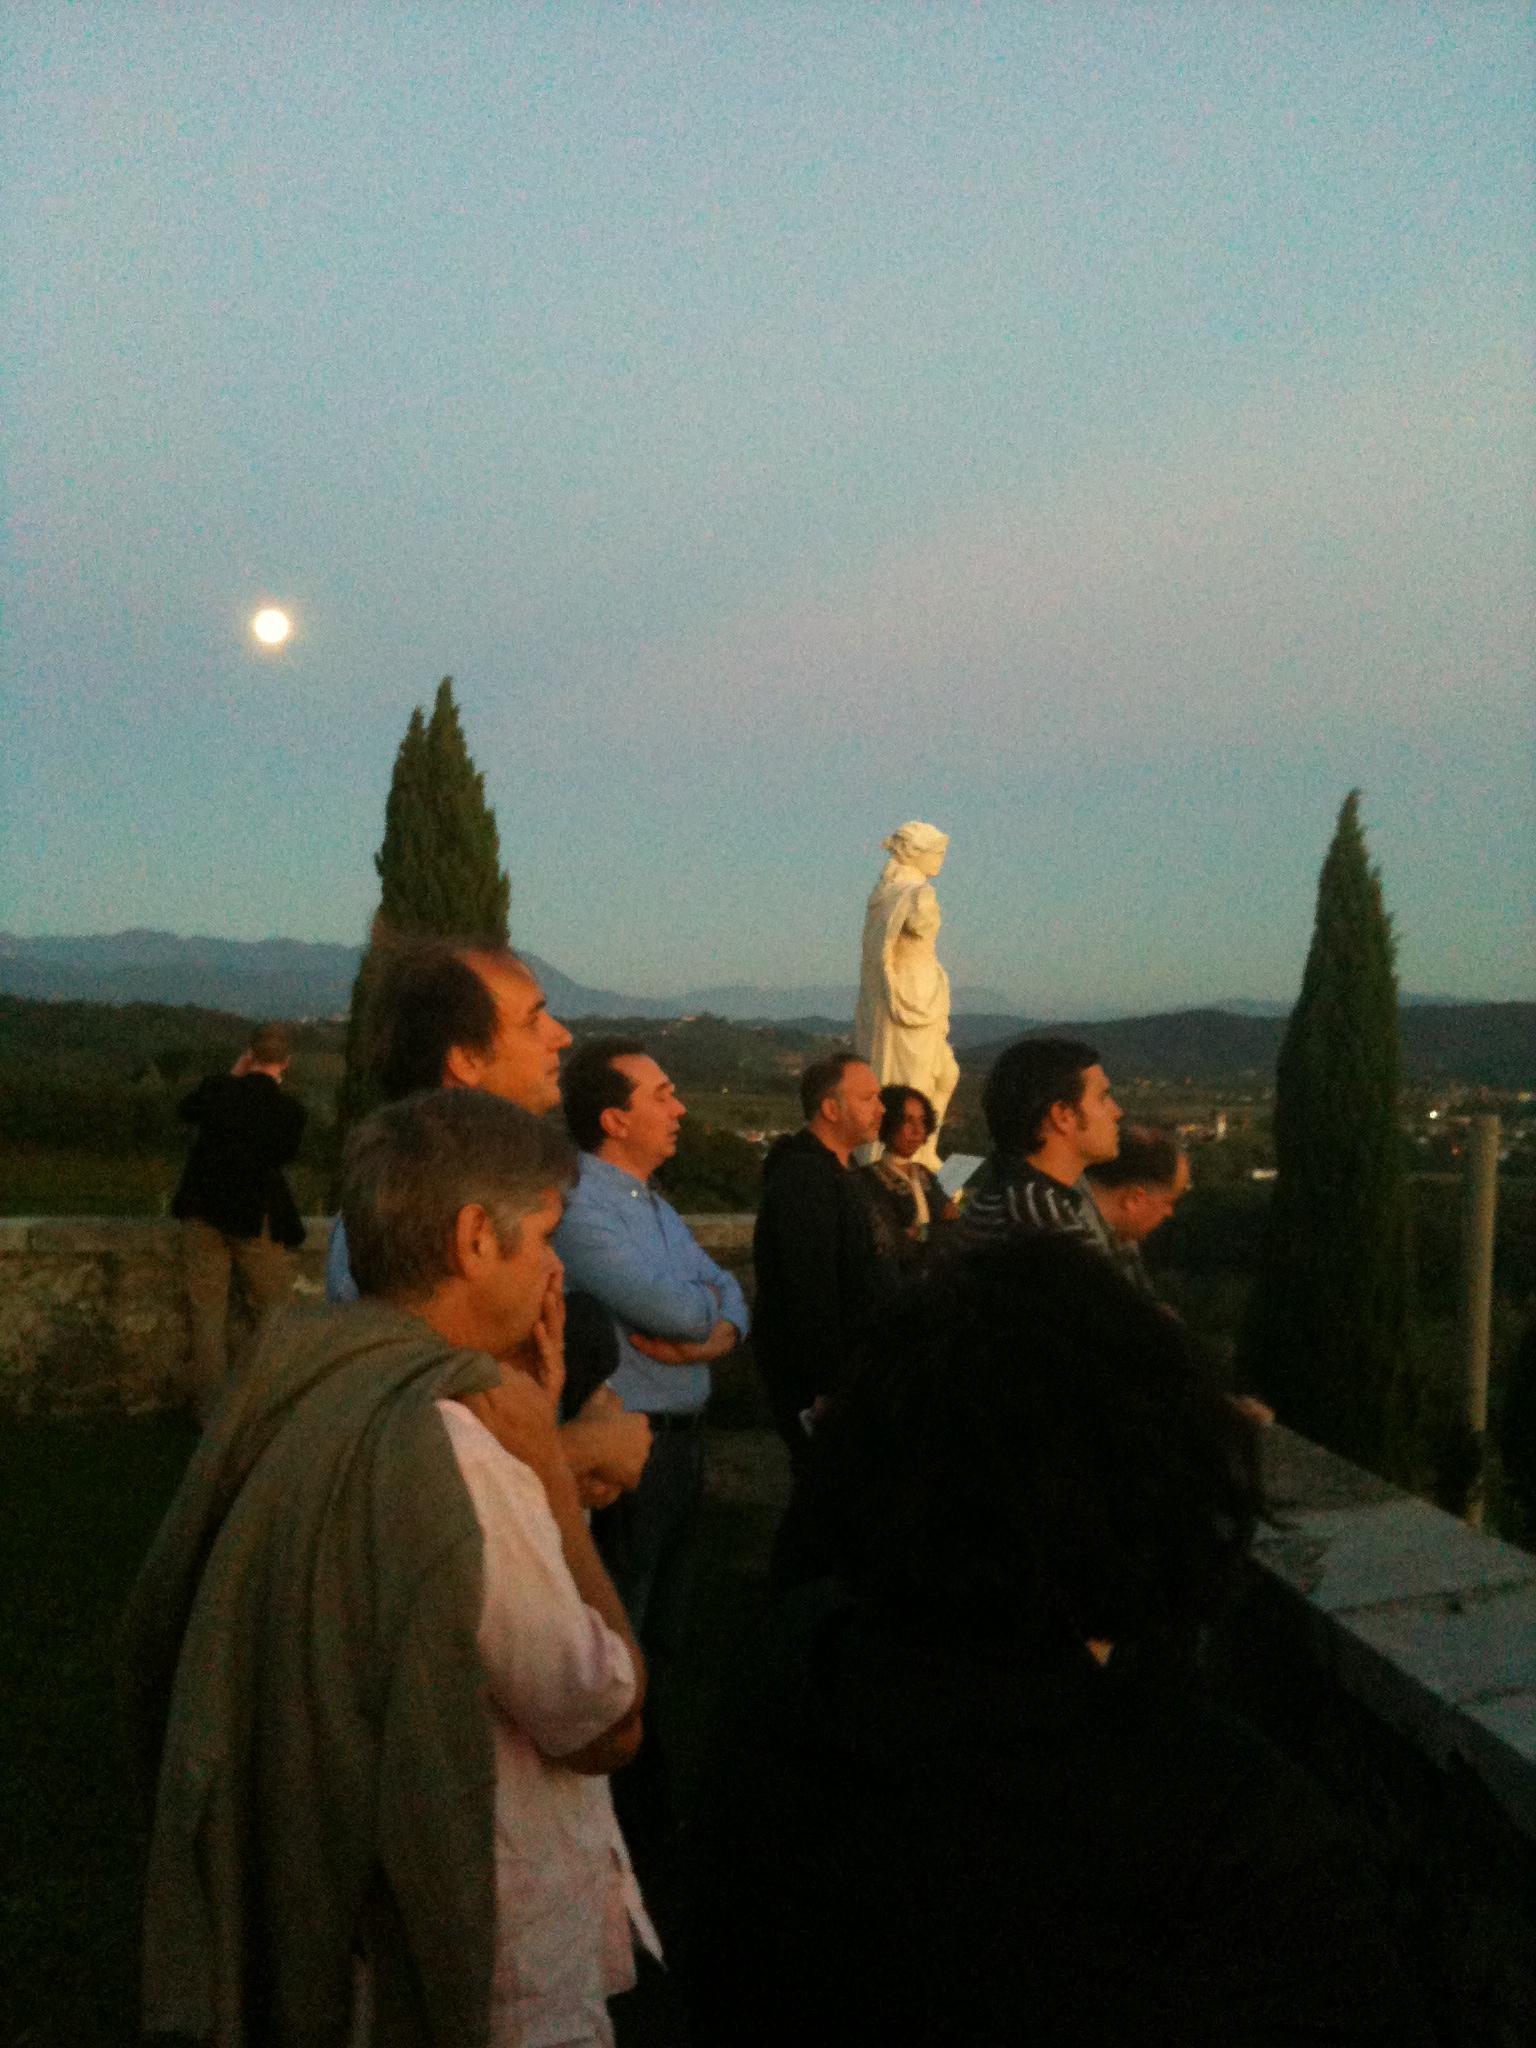 Sunset in Rosazzo